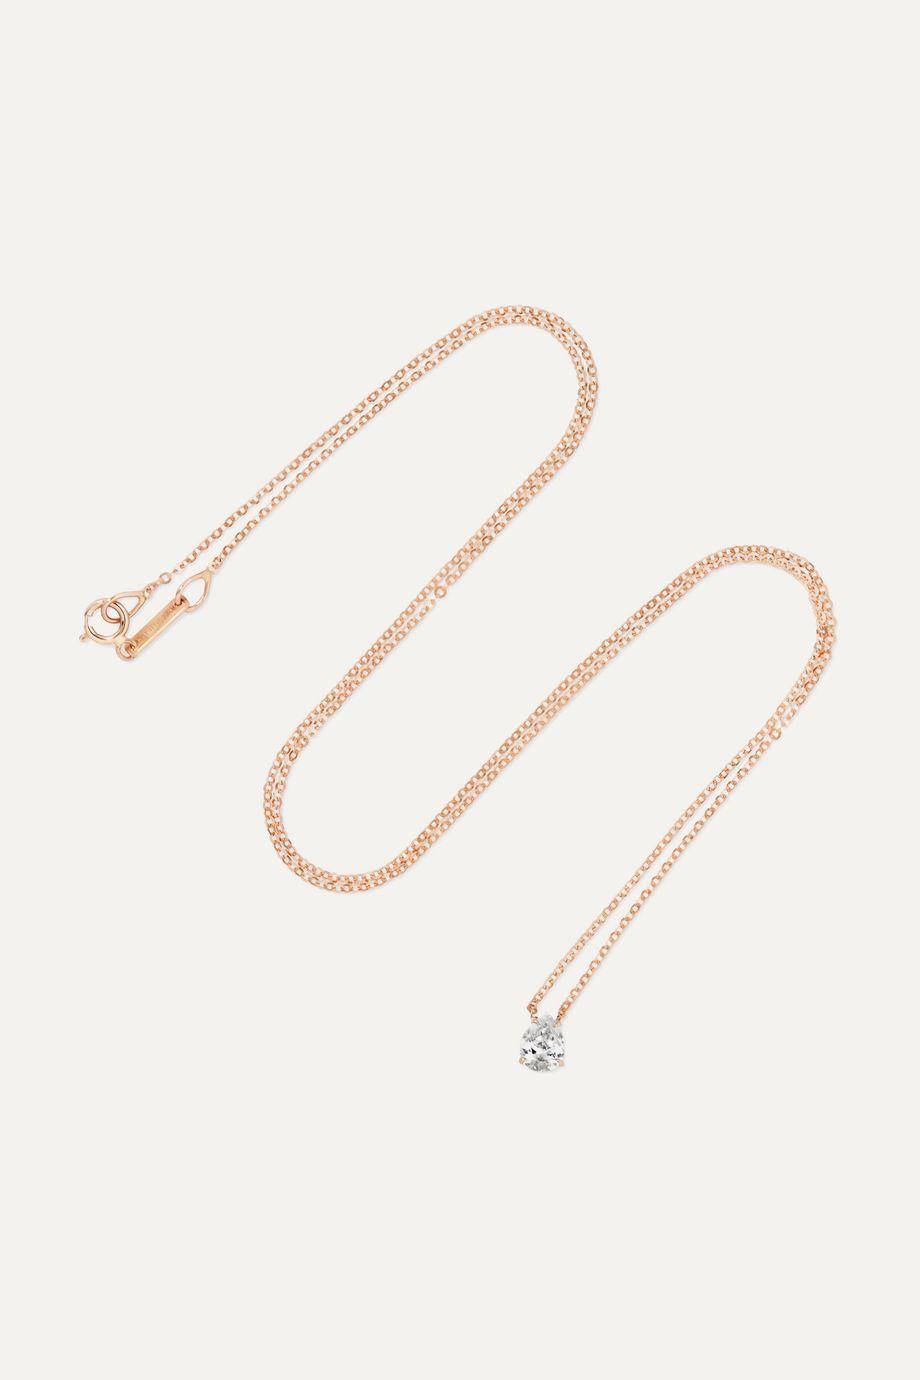 Anita Ko Collier en or rose 18 carats et diamant